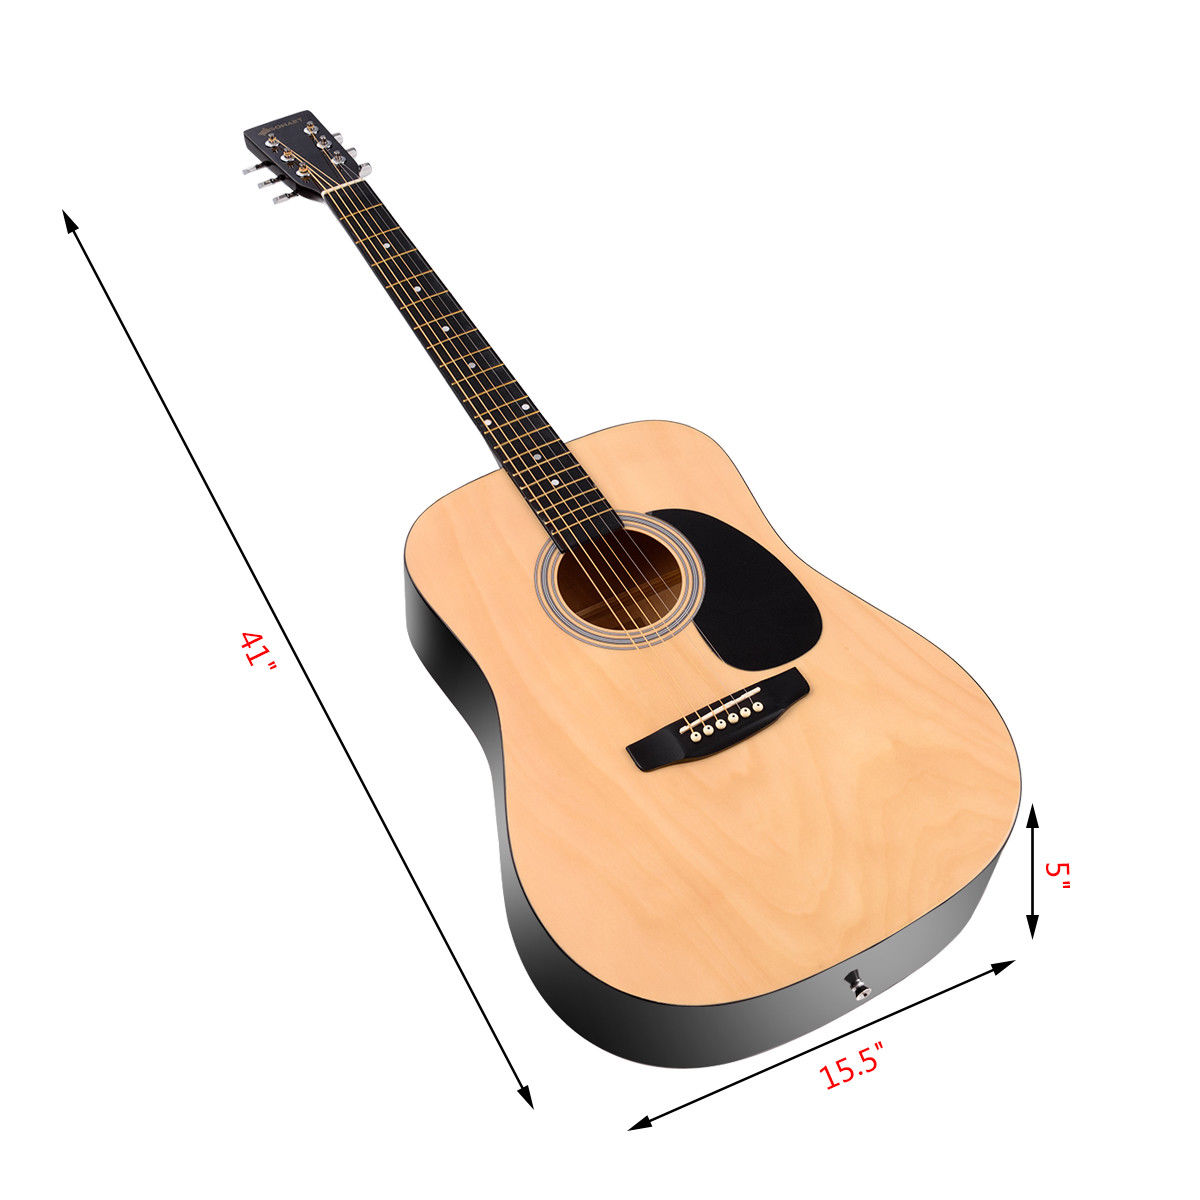 "Sonart 41"" Acoustic Folk Guitar 6 String w/ Case Strap Pick Strings Beginners - image 6 of 10"